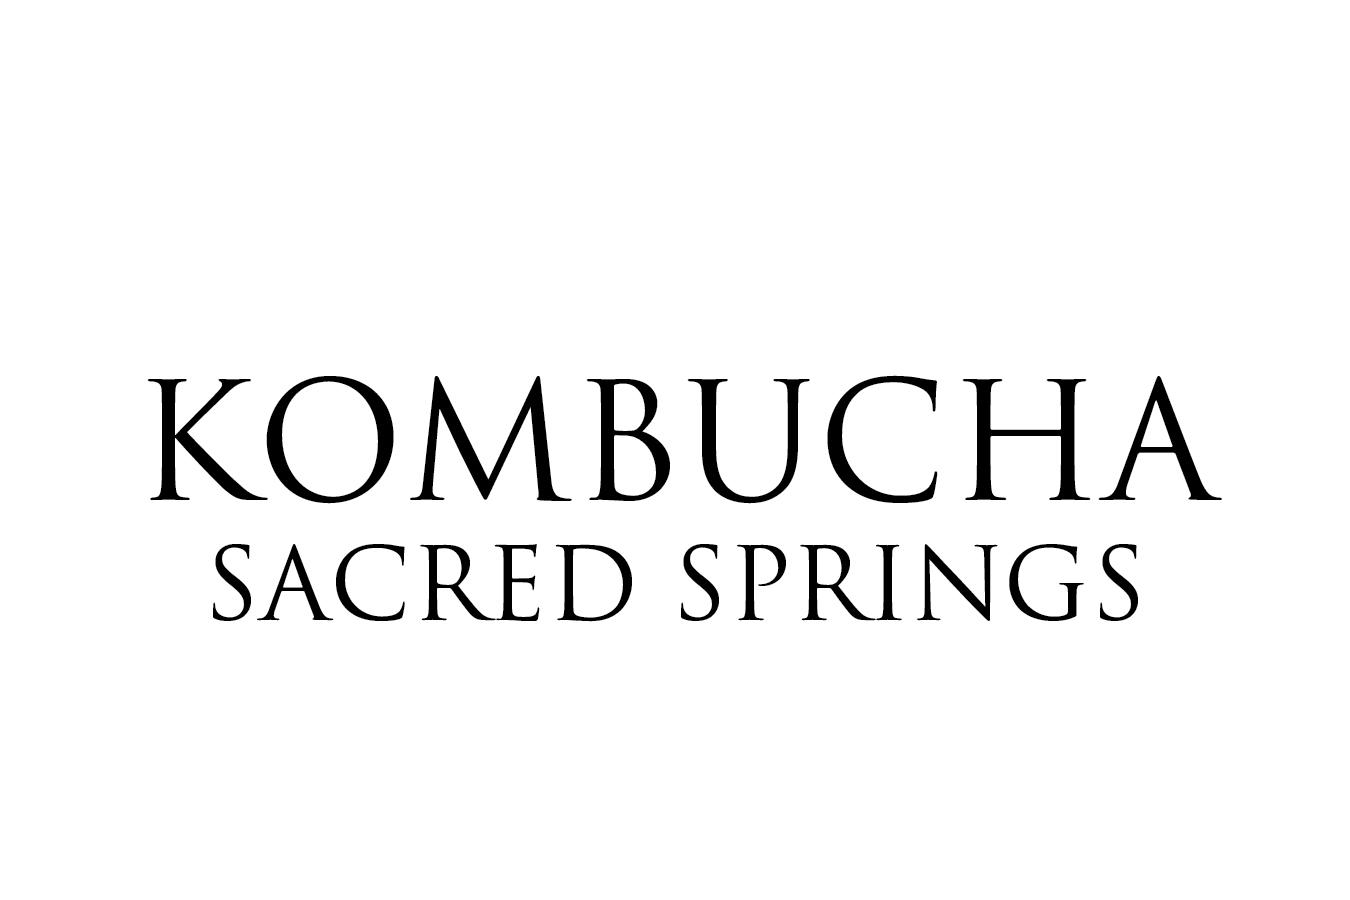 Sacred Springs Kombucha